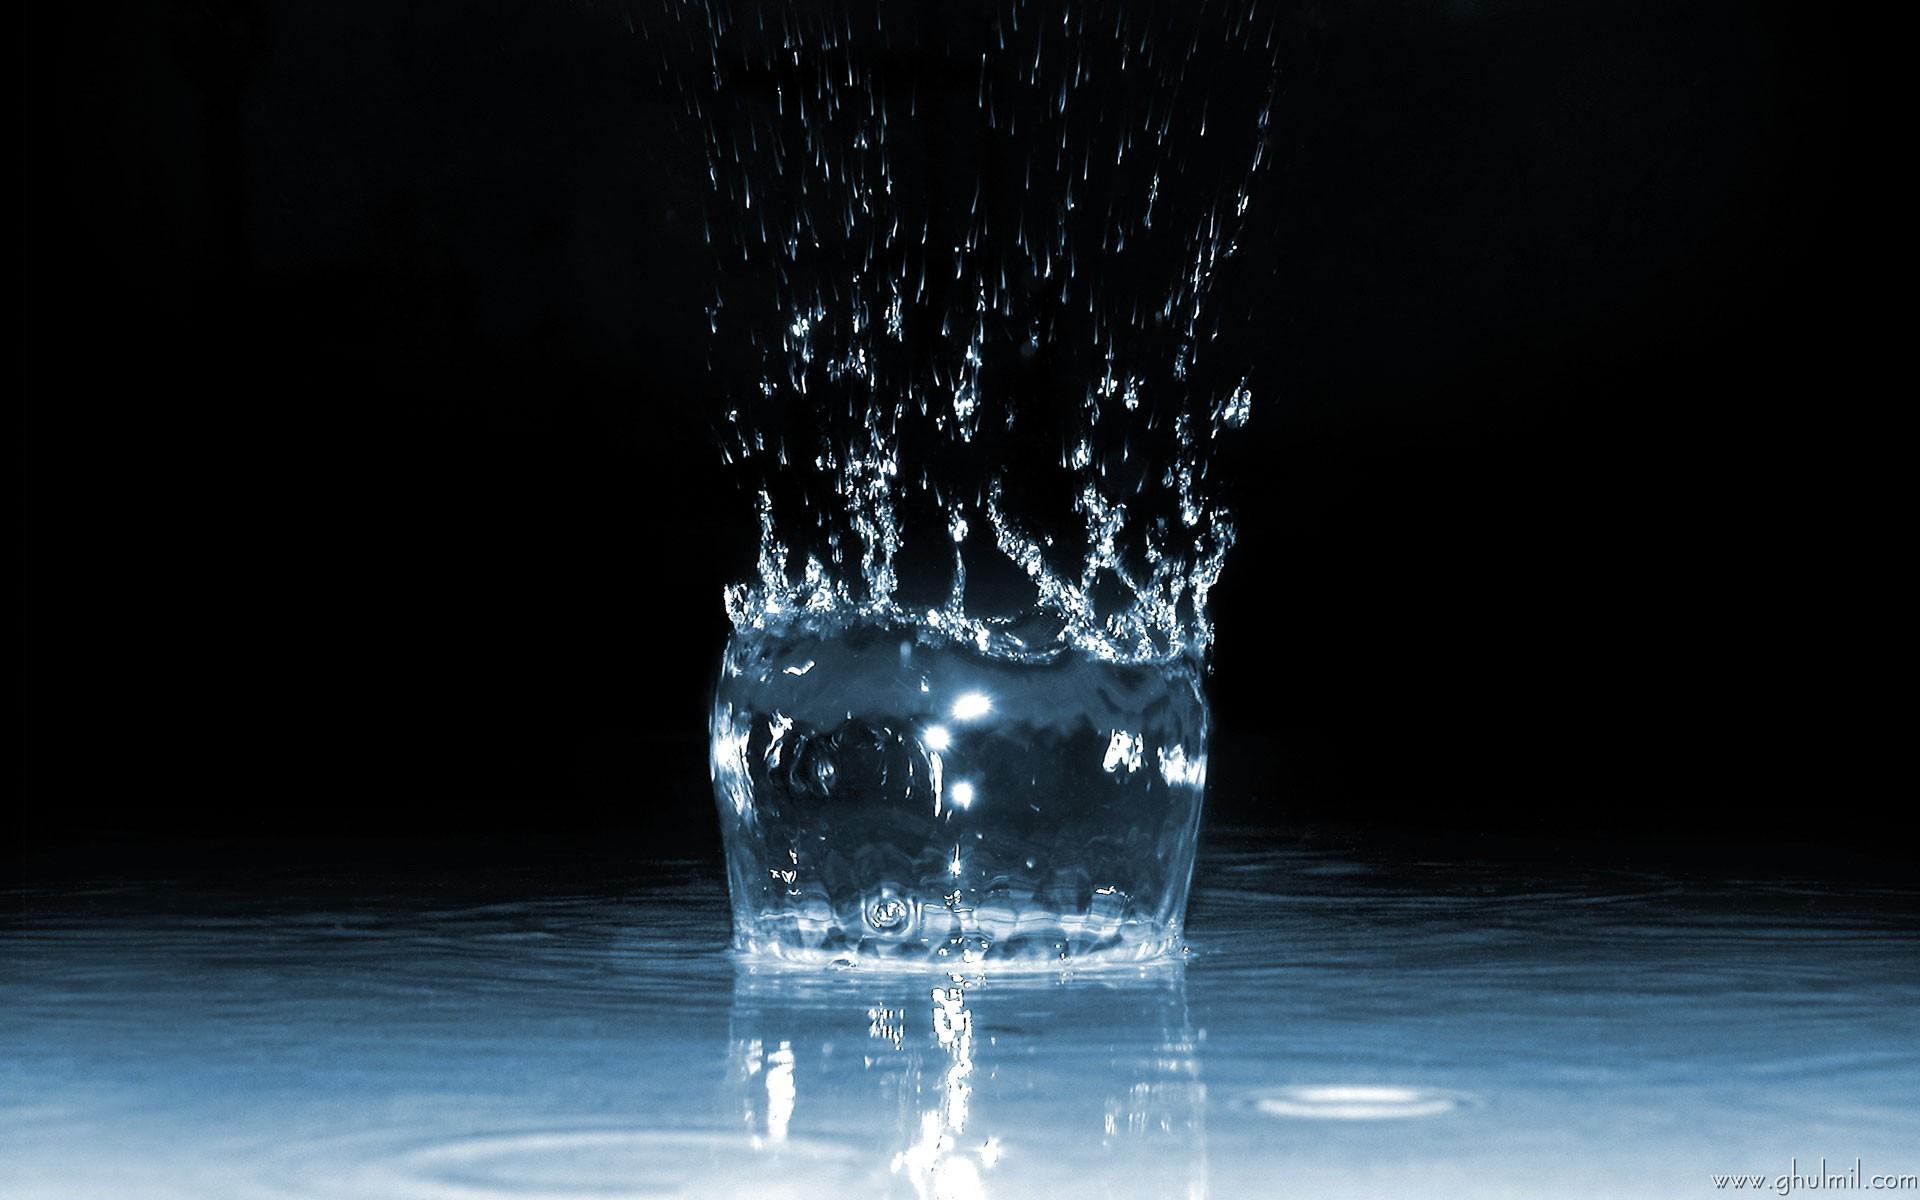 Hd Water Drops Wallpaper 79 Images